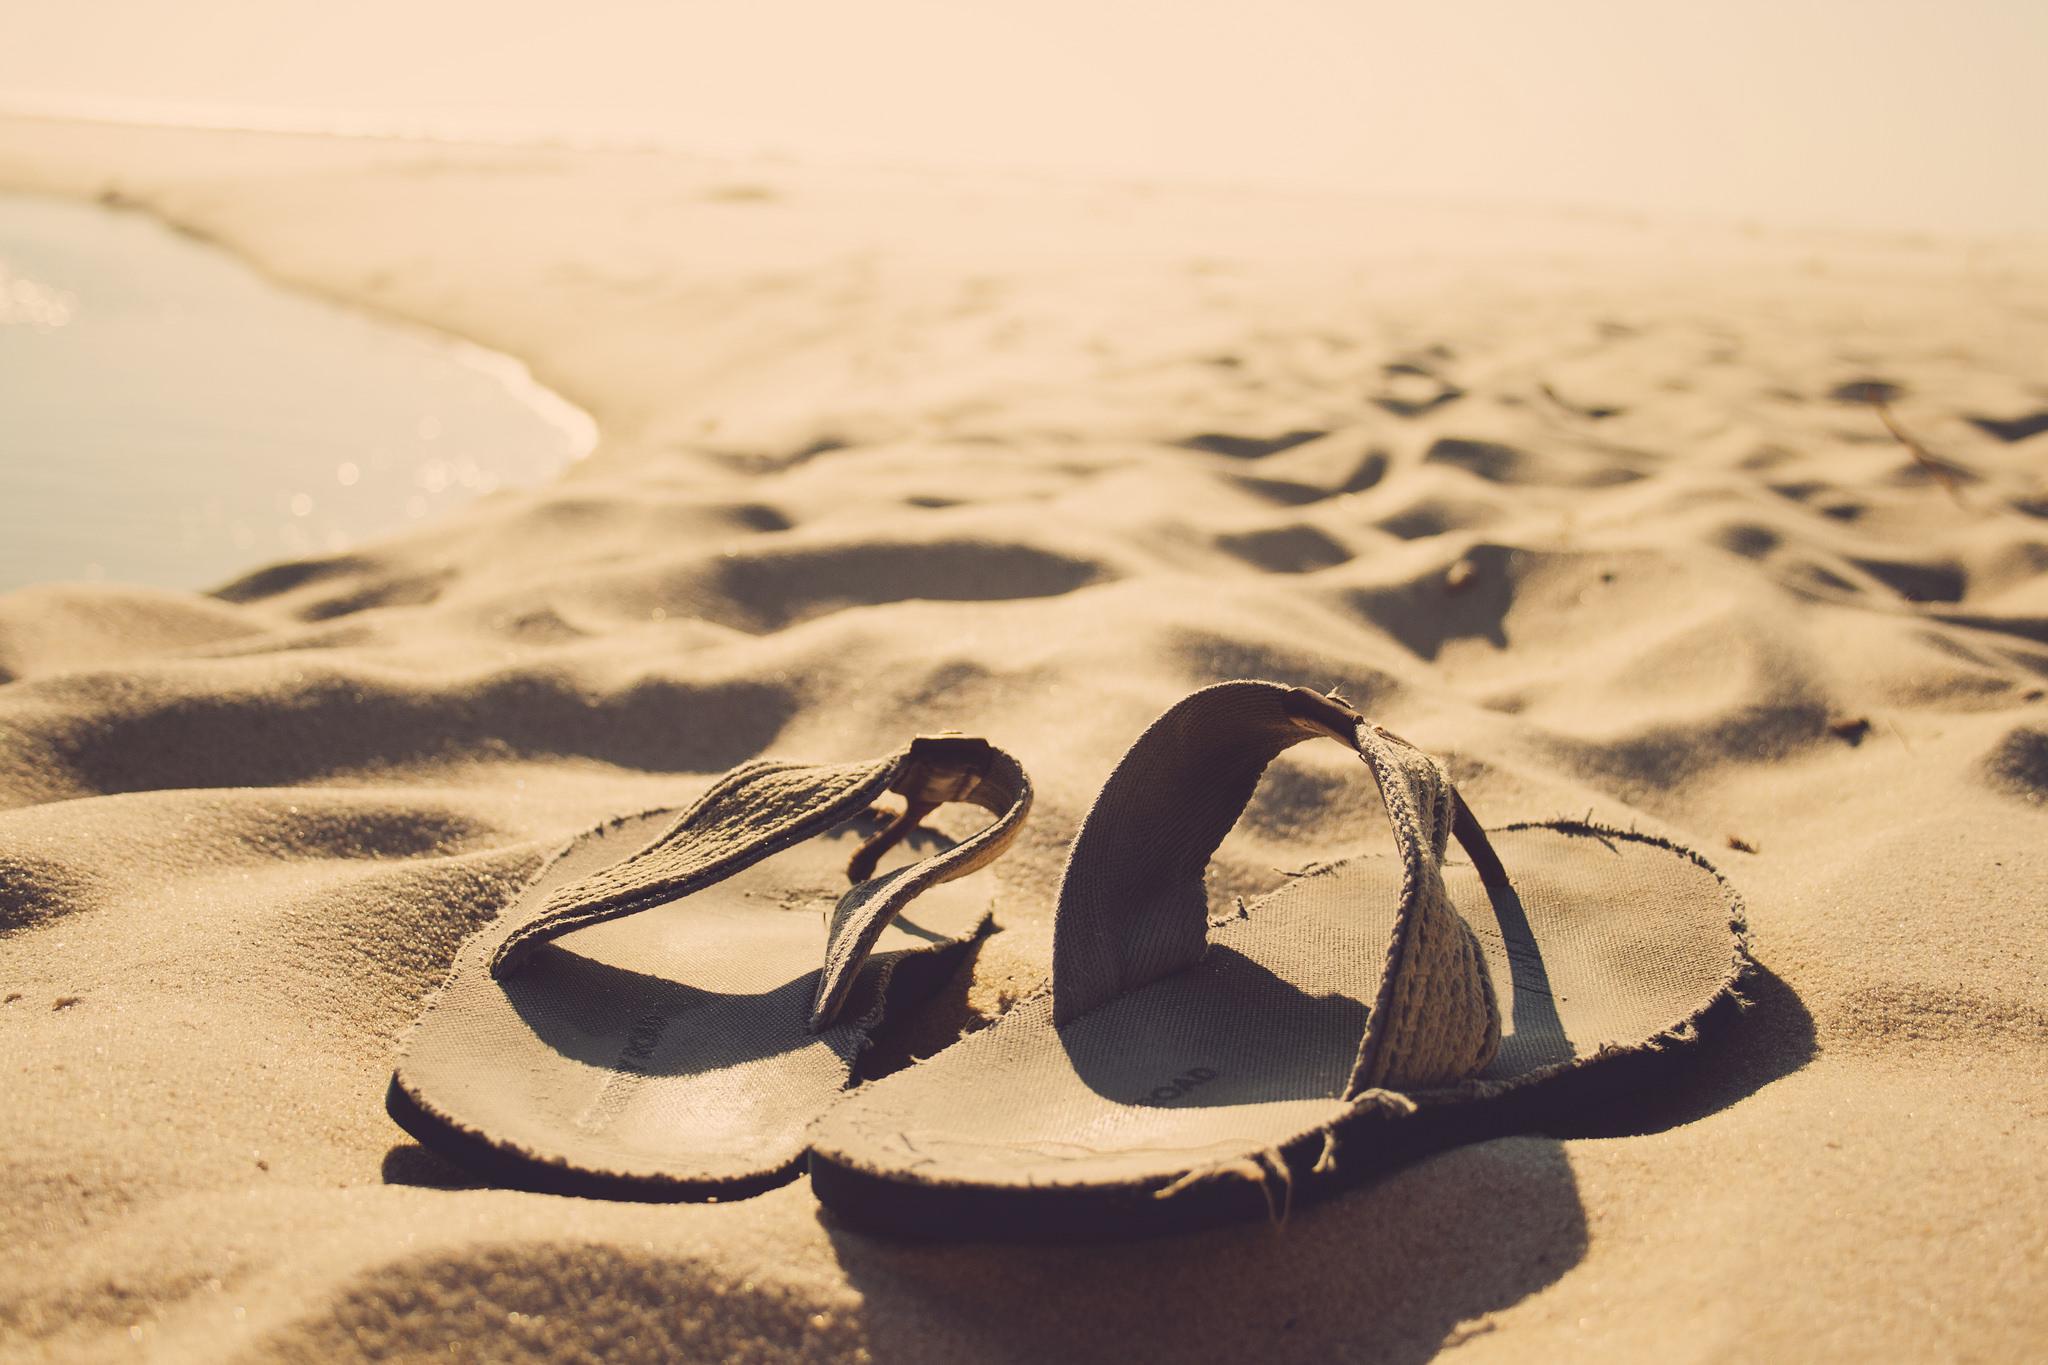 Thongs in sand